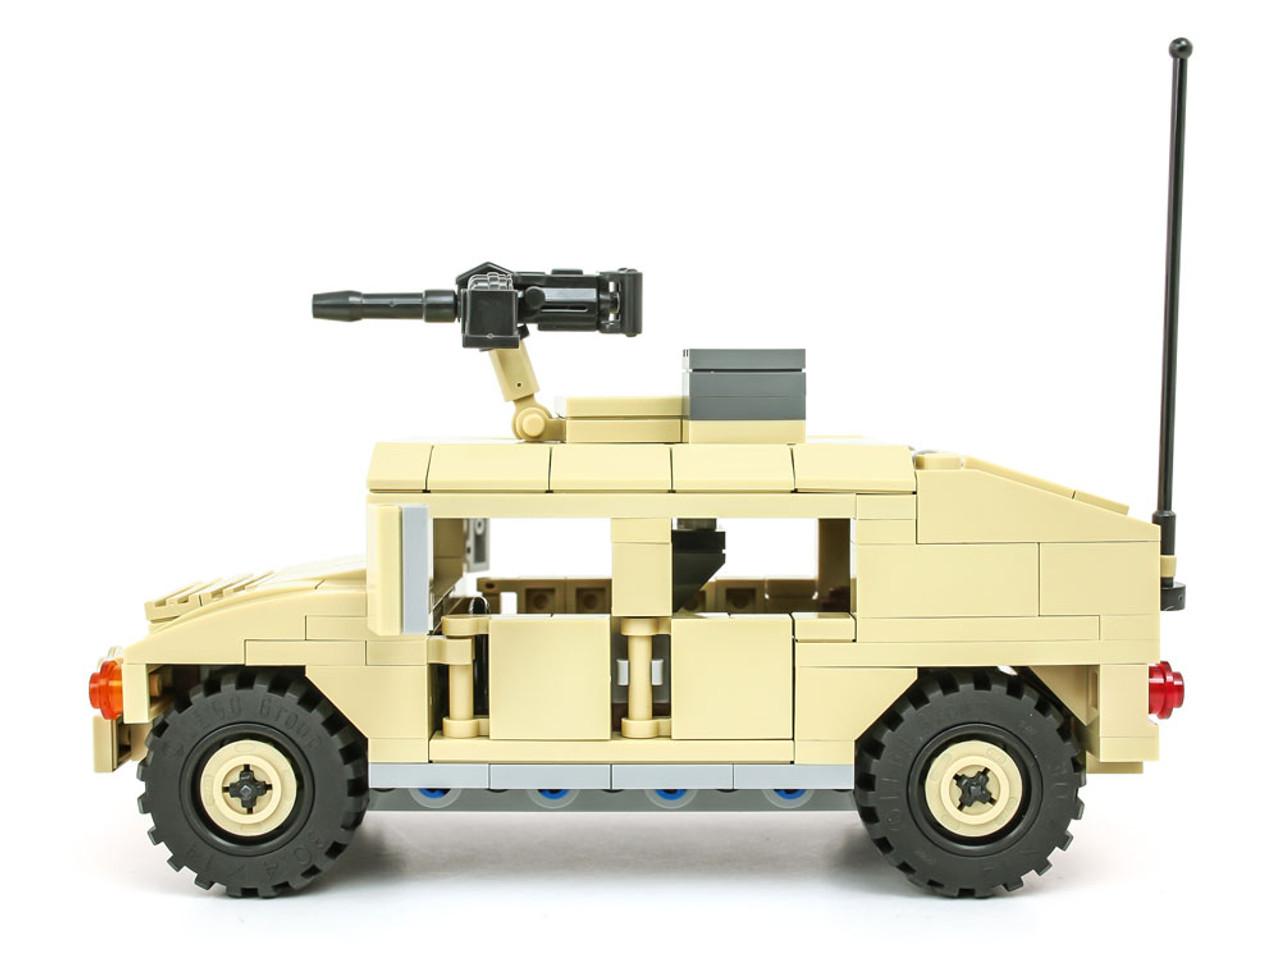 HMMWV + Mk 19 Grenade Launcher